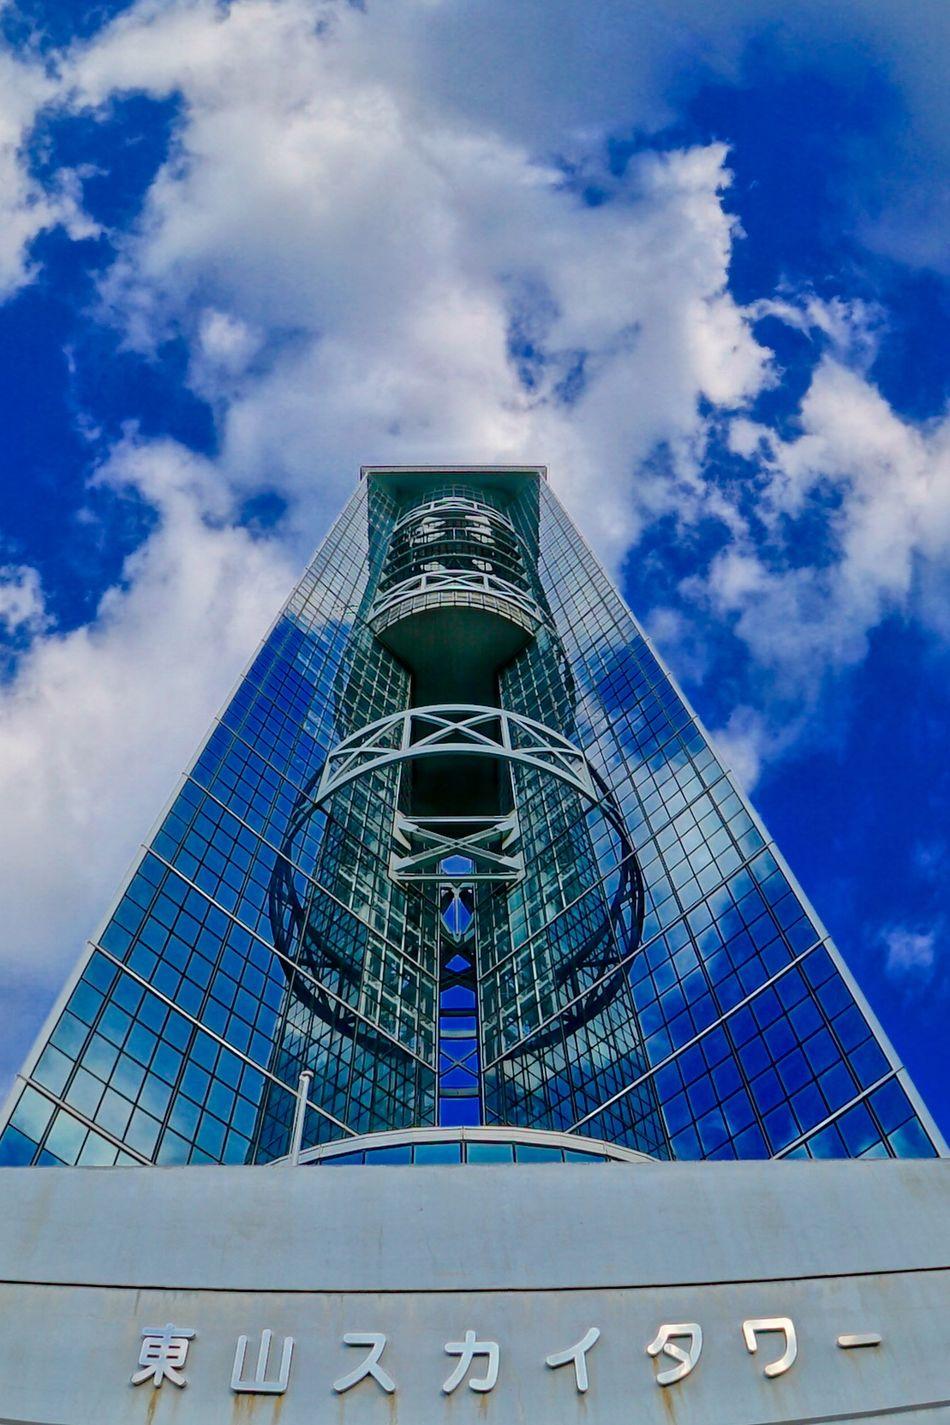 EyeEm Best Shots - Reflections Reflection 空 Blue Sky 名古屋 Tower